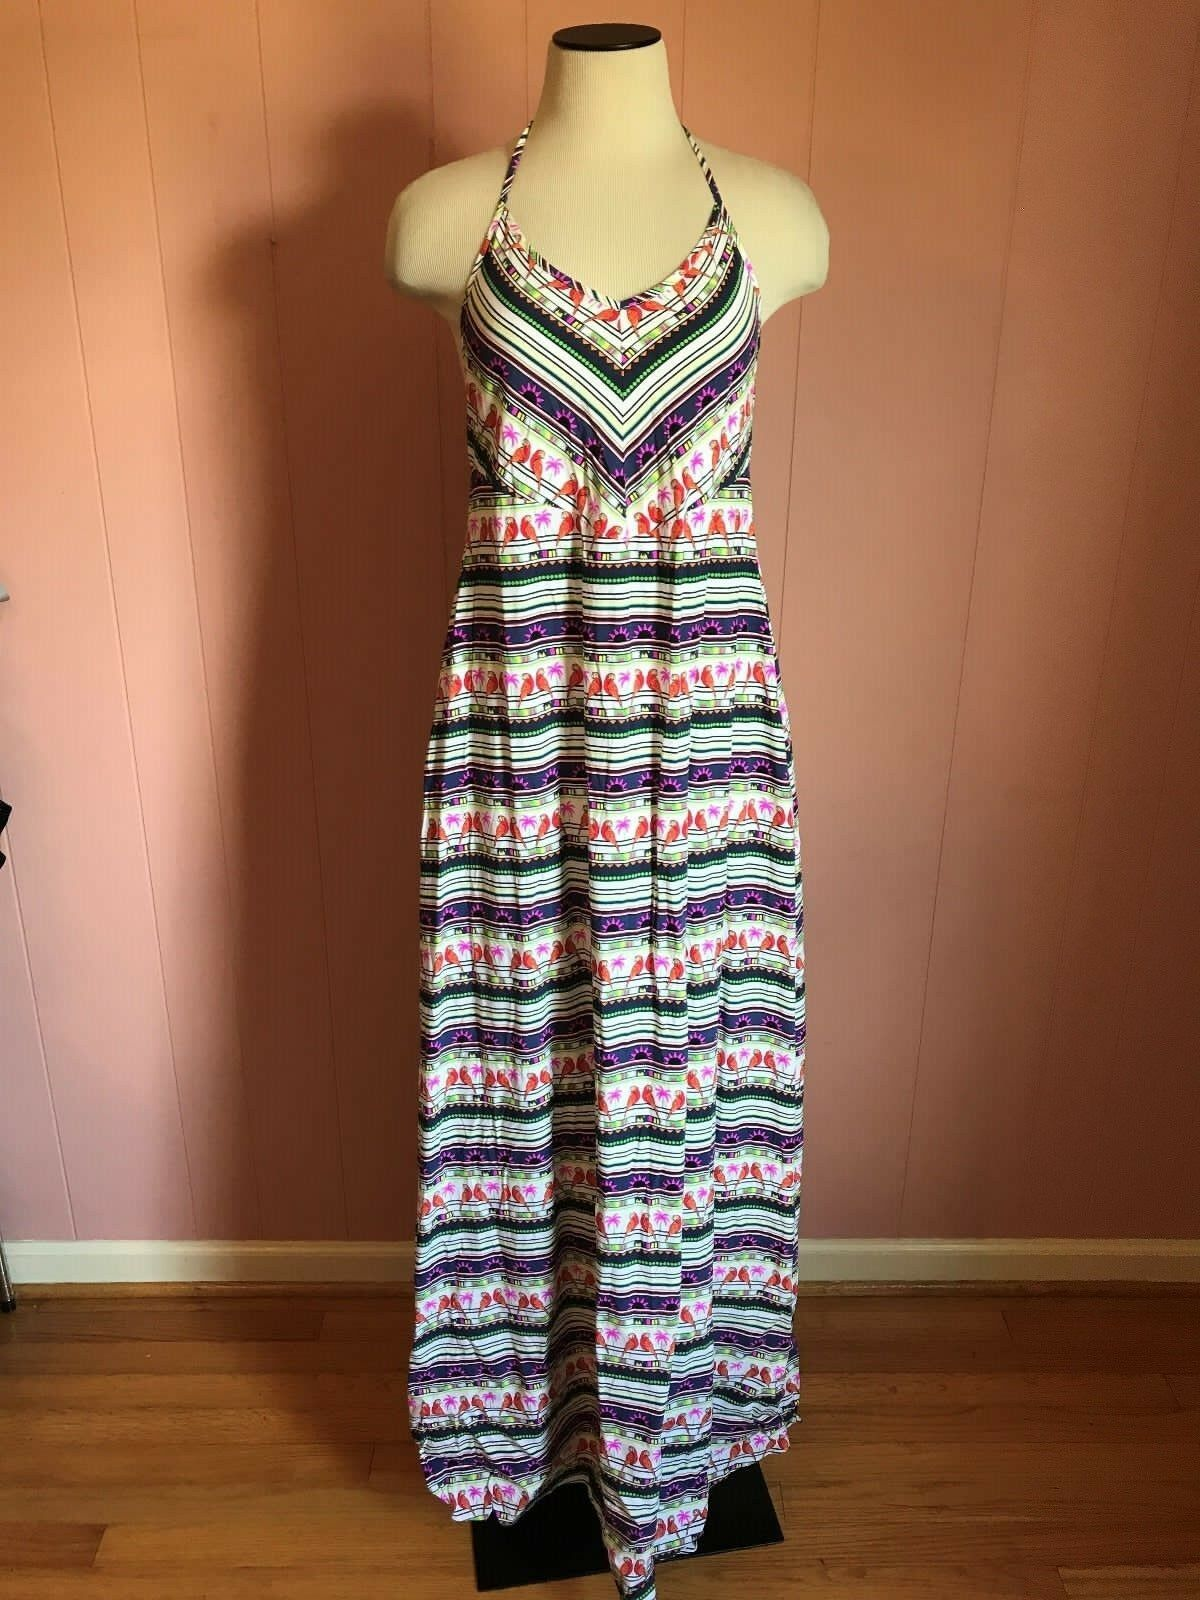 Mara Hoffman for J.Crew Parred Dress L Large C0039  248 Sundress Pink bluee Multi